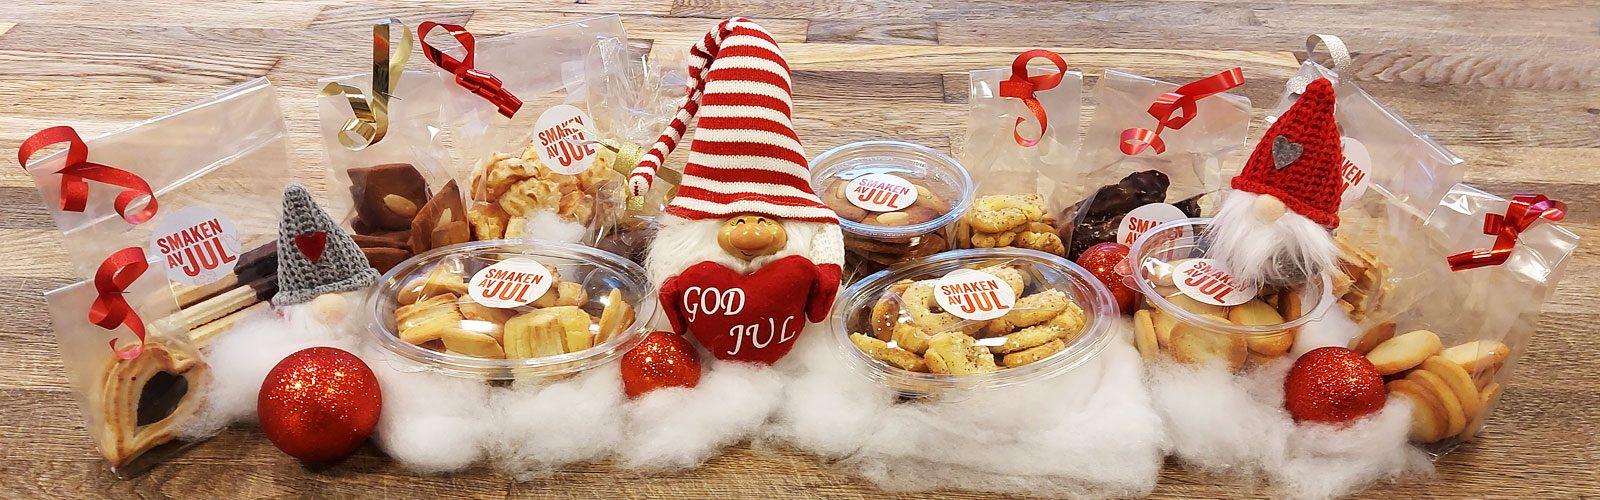 juleprodukter-med-nisser